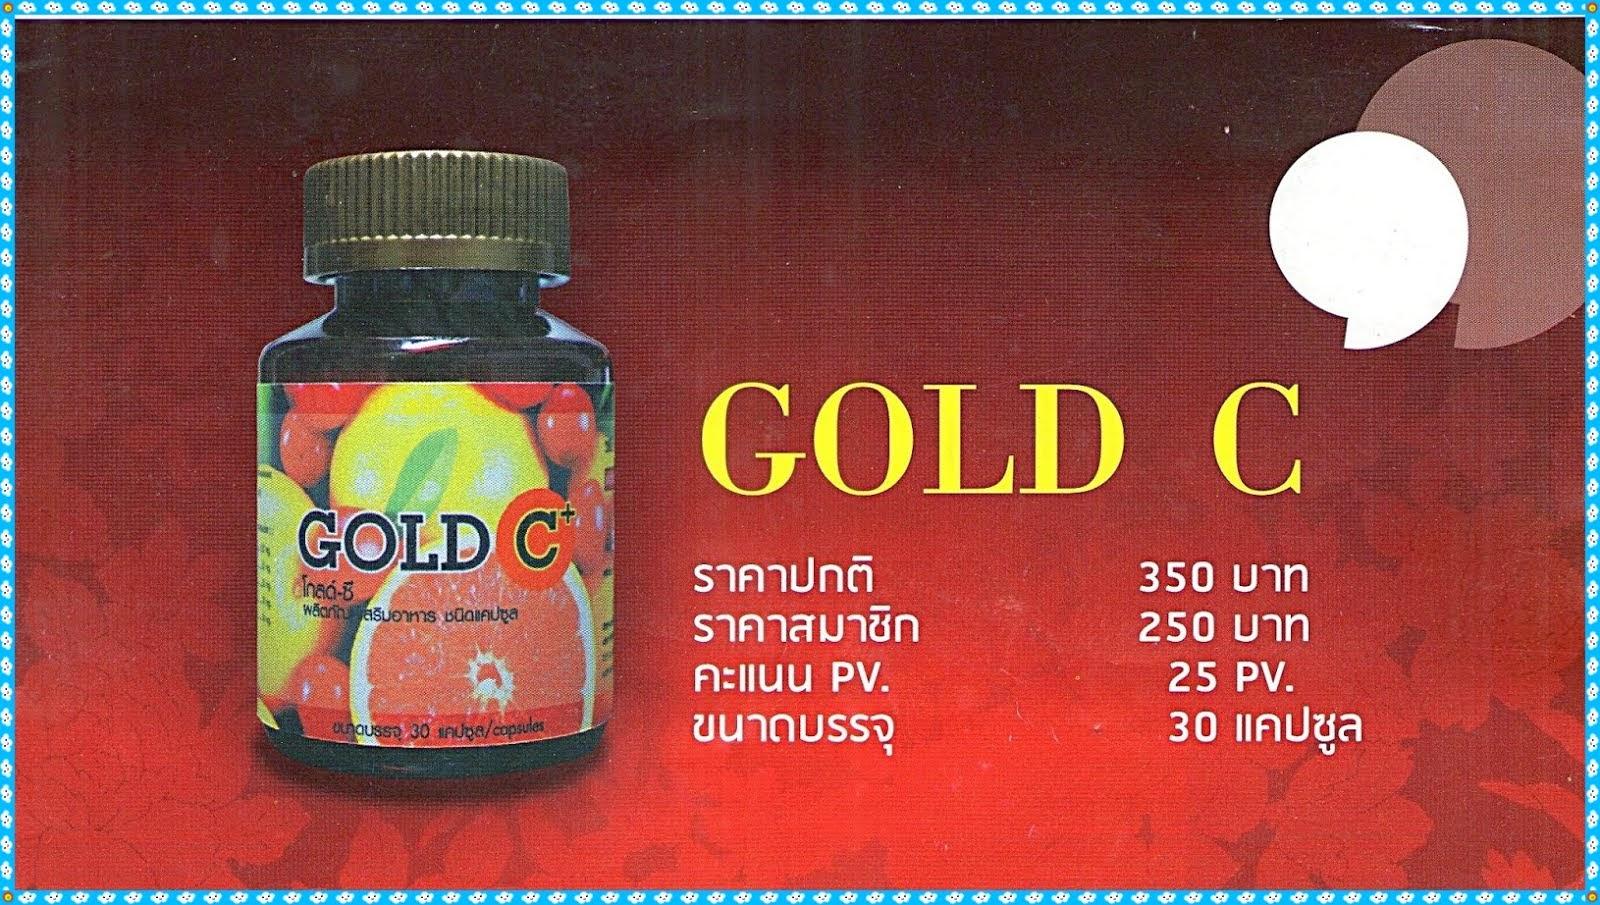 Gold C โกลด์ ซี